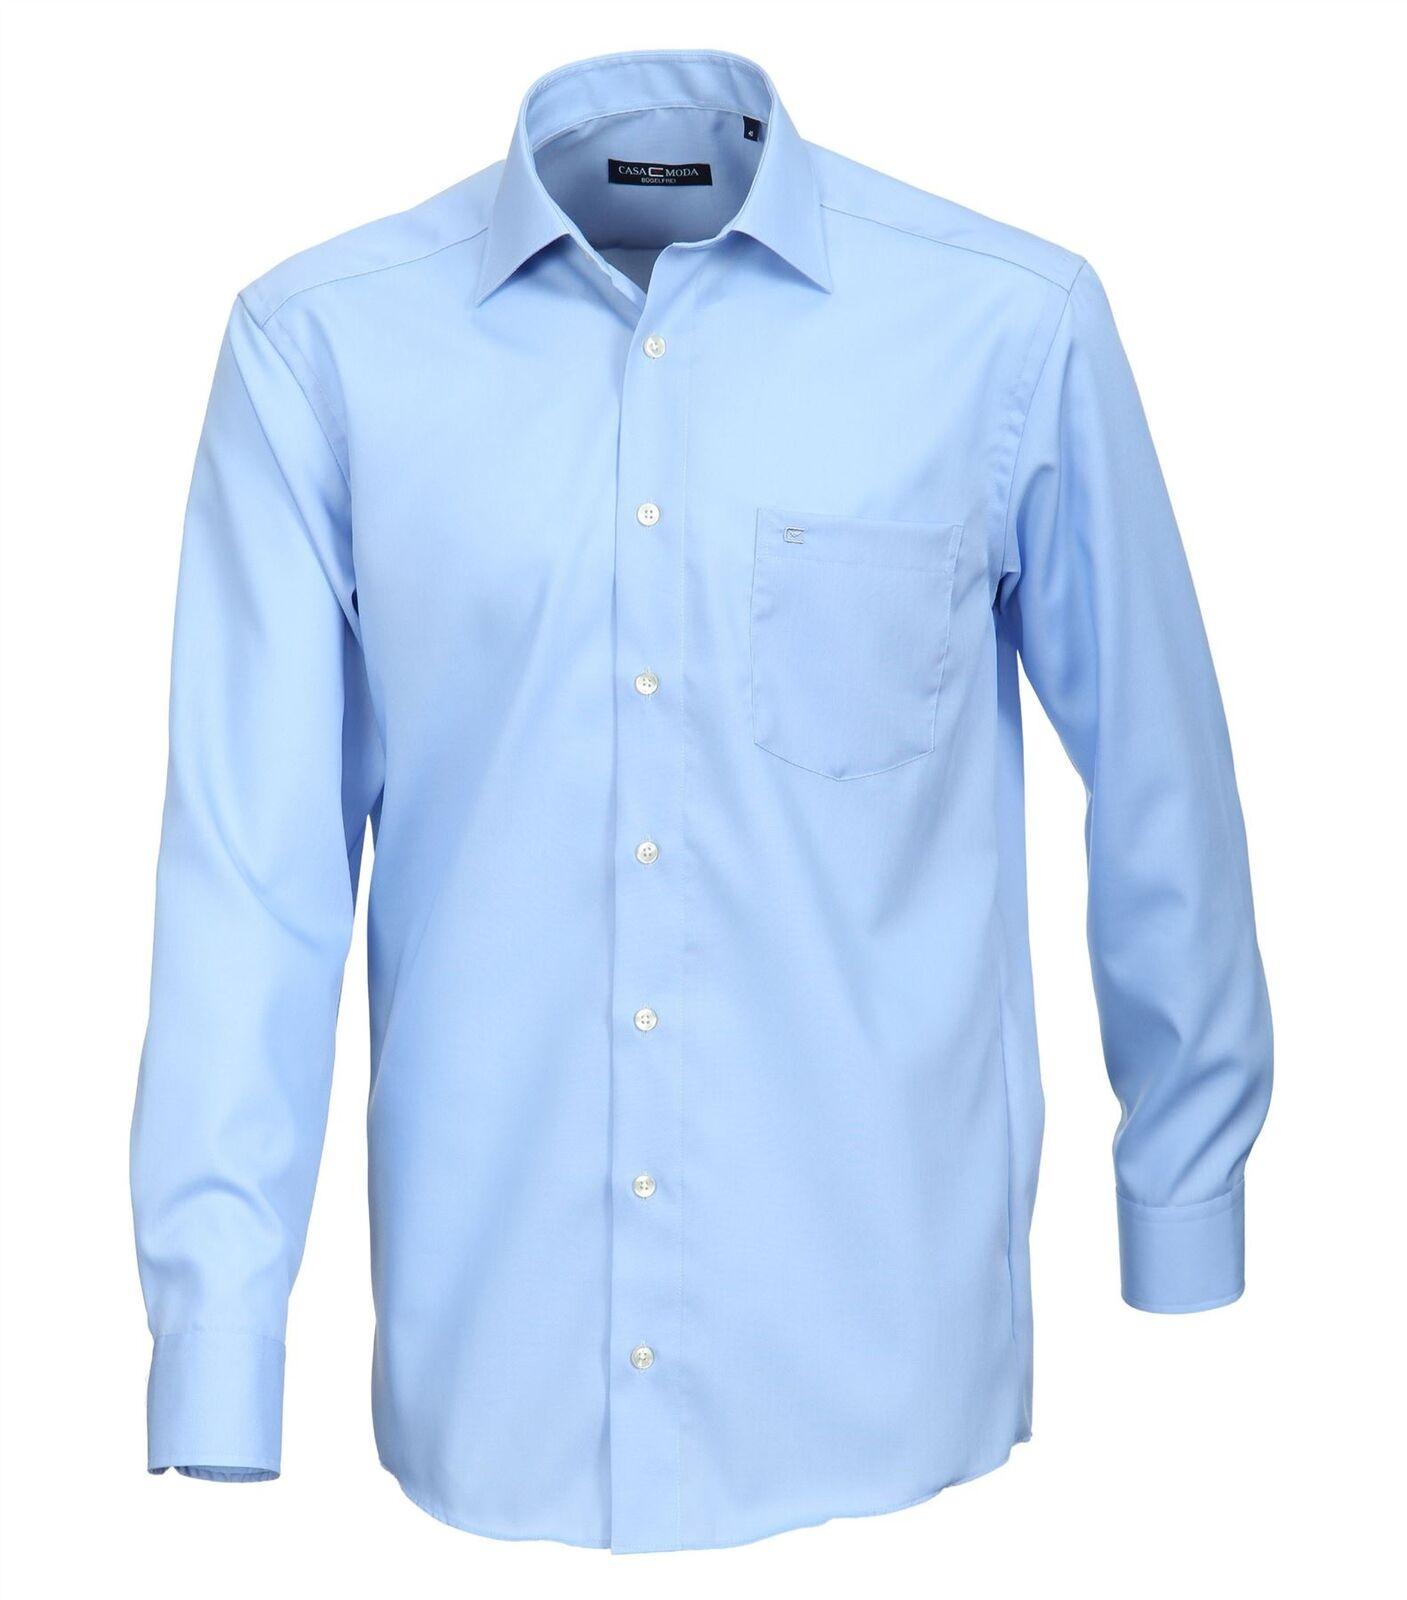 Casa Moda Pure baumwolle Kent halsband Long Sleeved Business hemds, Größe 18 to 22